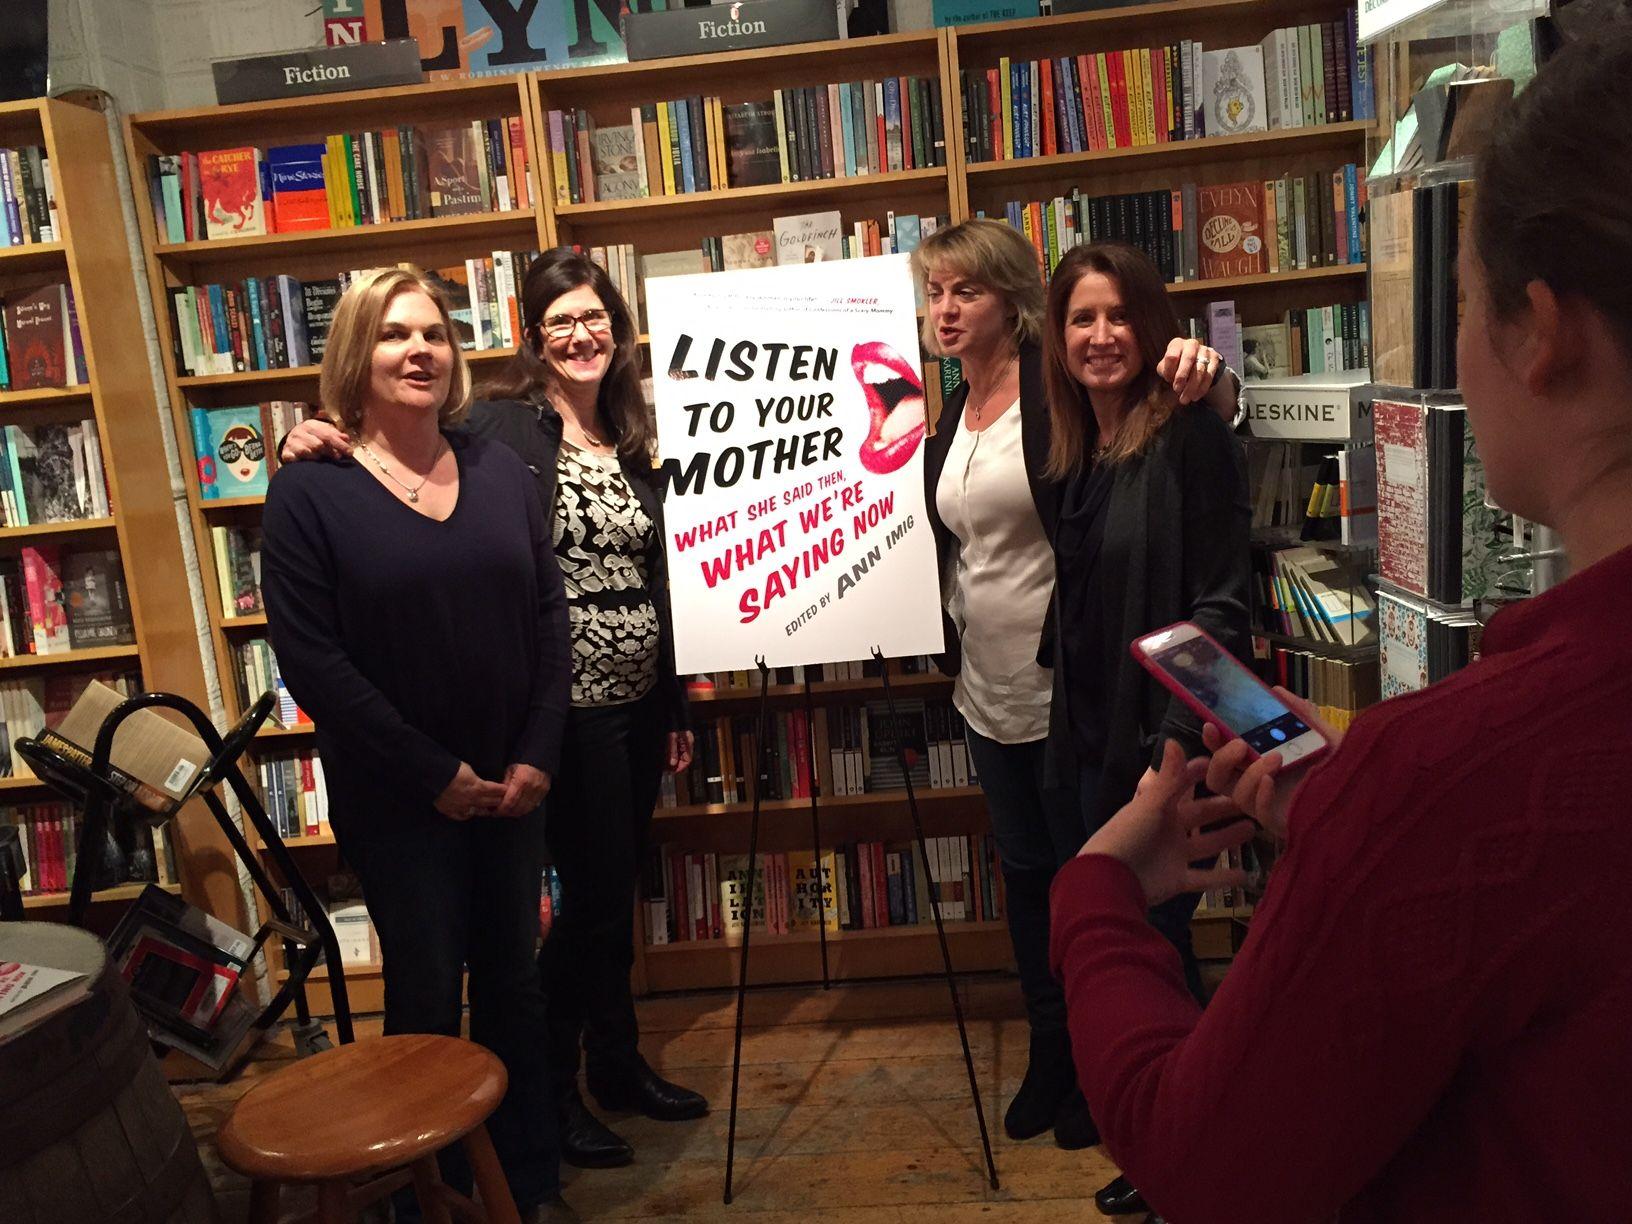 l to r Helen Brickfield, Kathy Kate Mayer, Barb Patrick and Tara Kortze